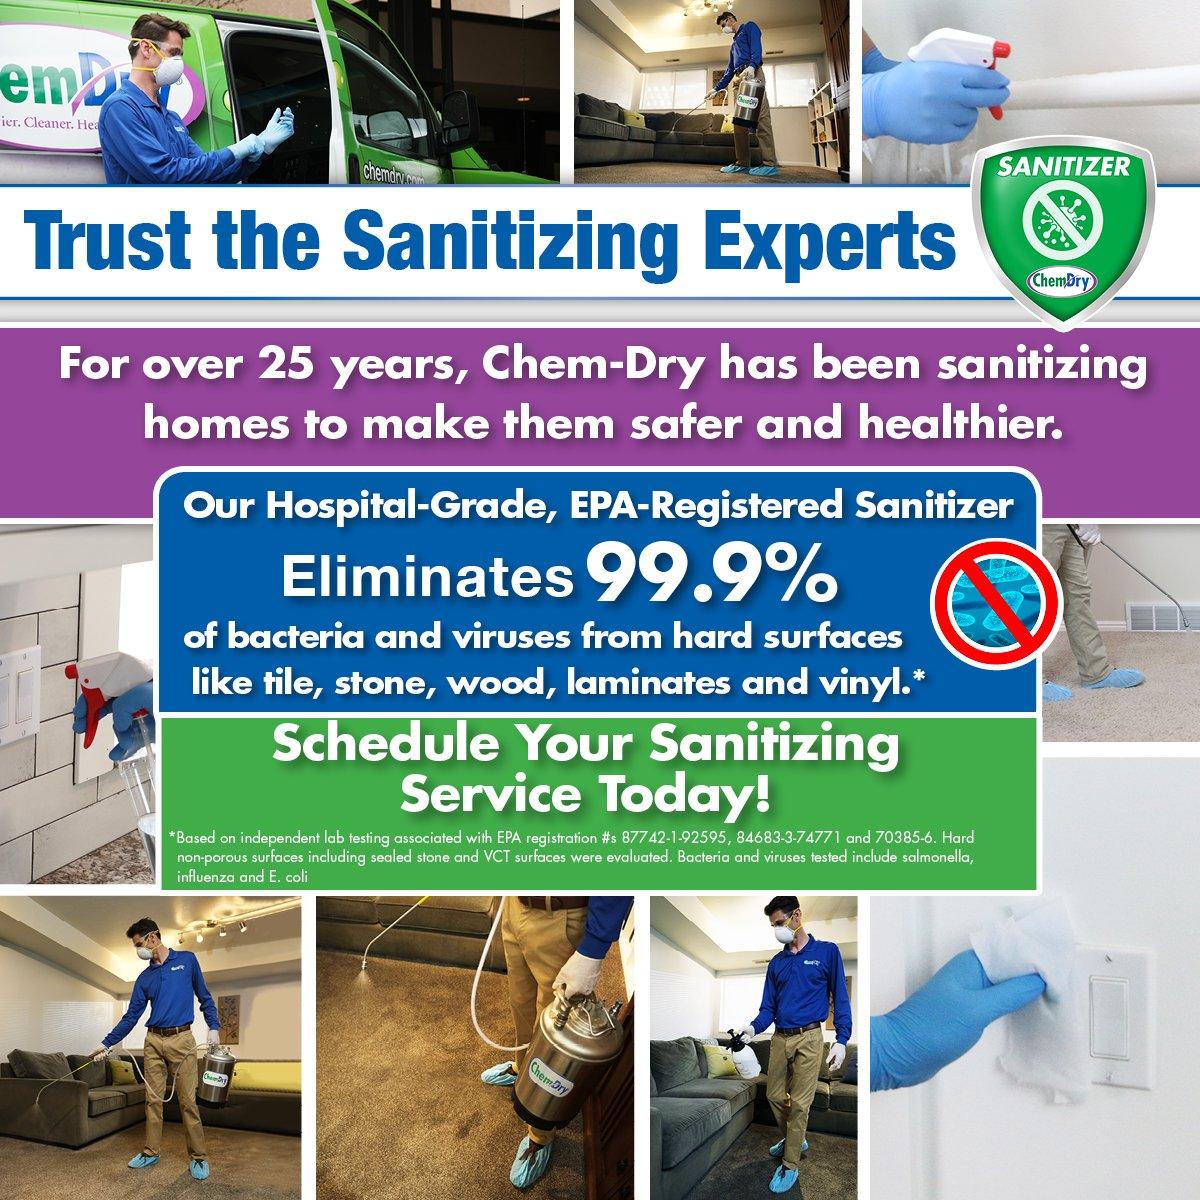 chem-dry hospital-grade sanitizer information graphic